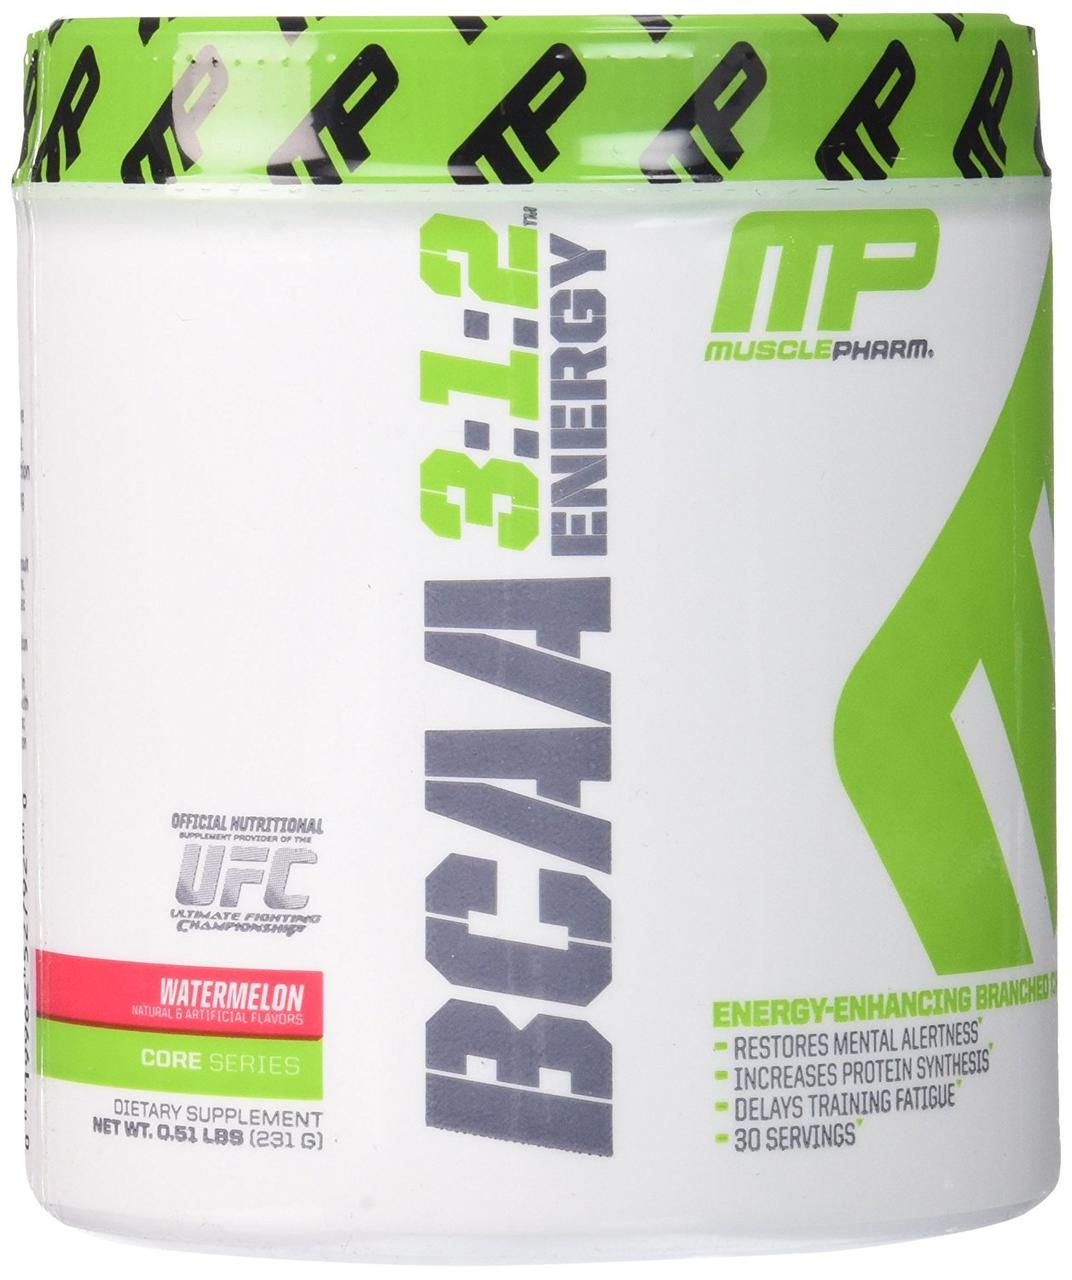 Muscle Pharm BCAA 3:1:2 Energy 30 serv 231 g, Масл Фарм БЦА 3:1:2 Энержи 231 грамм